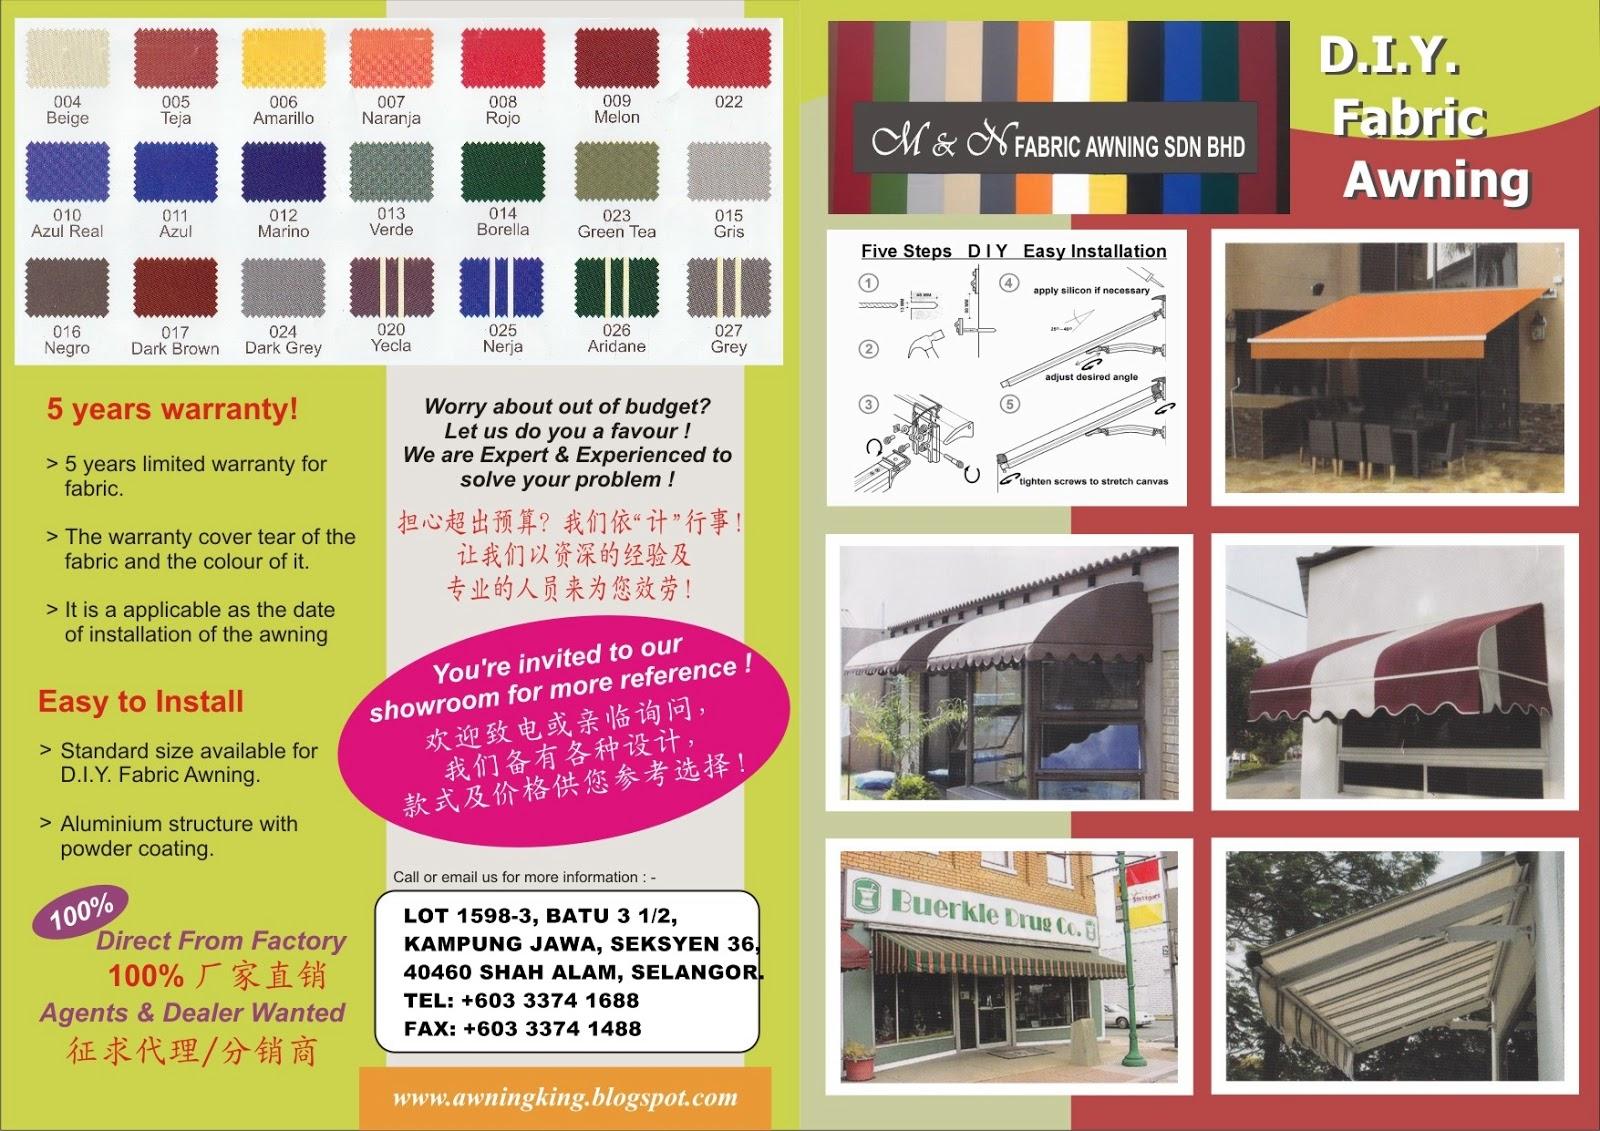 M Amp N Fabric Awning Sdn Bhd